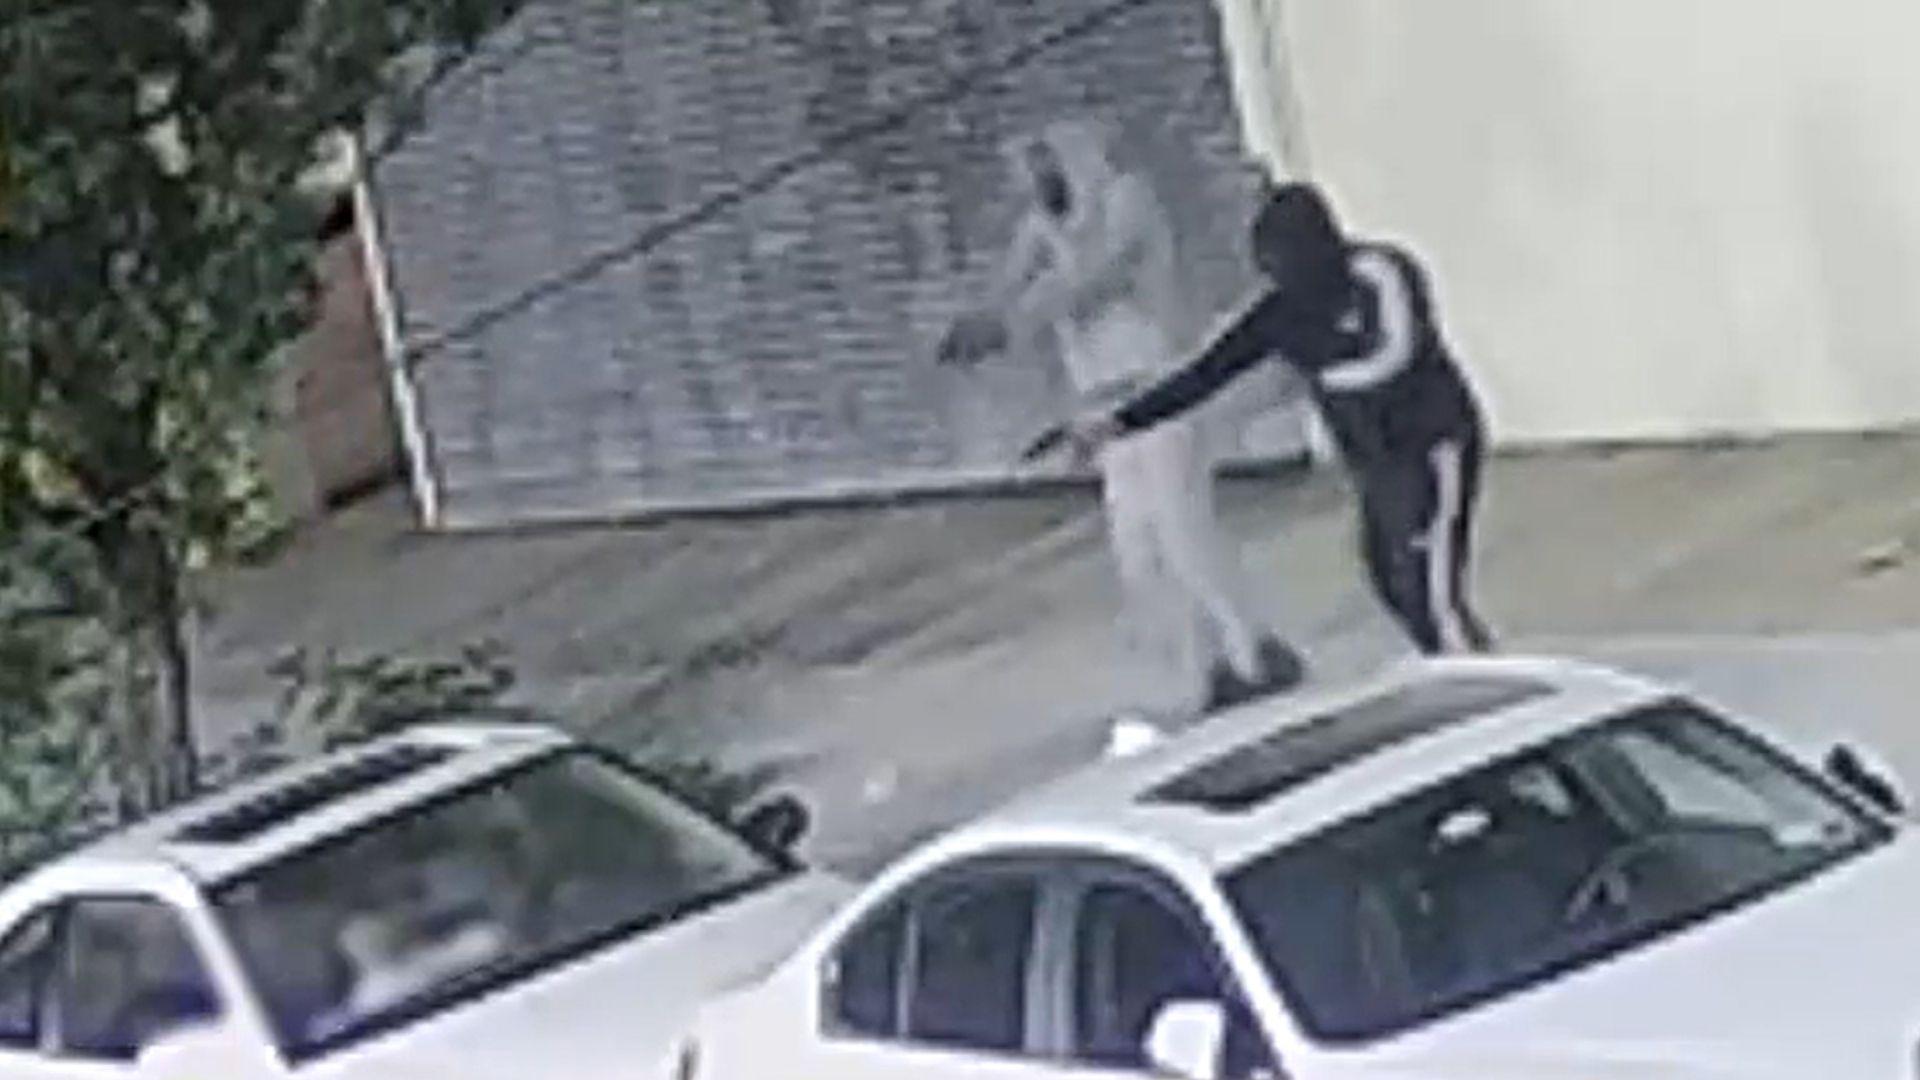 Men shoot into parked car on Brooklyn street